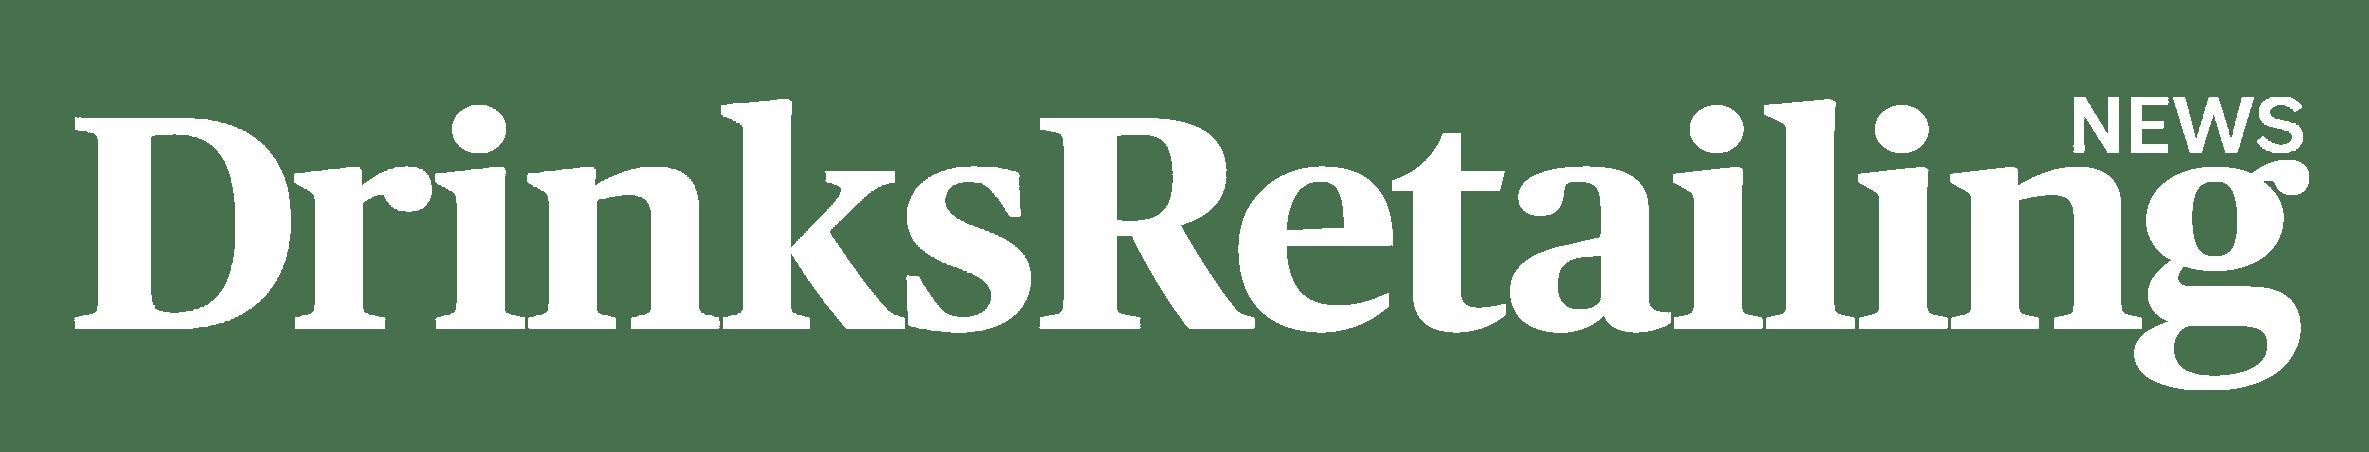 Drinks Retailing News logo transparent background white on trade marketing advice